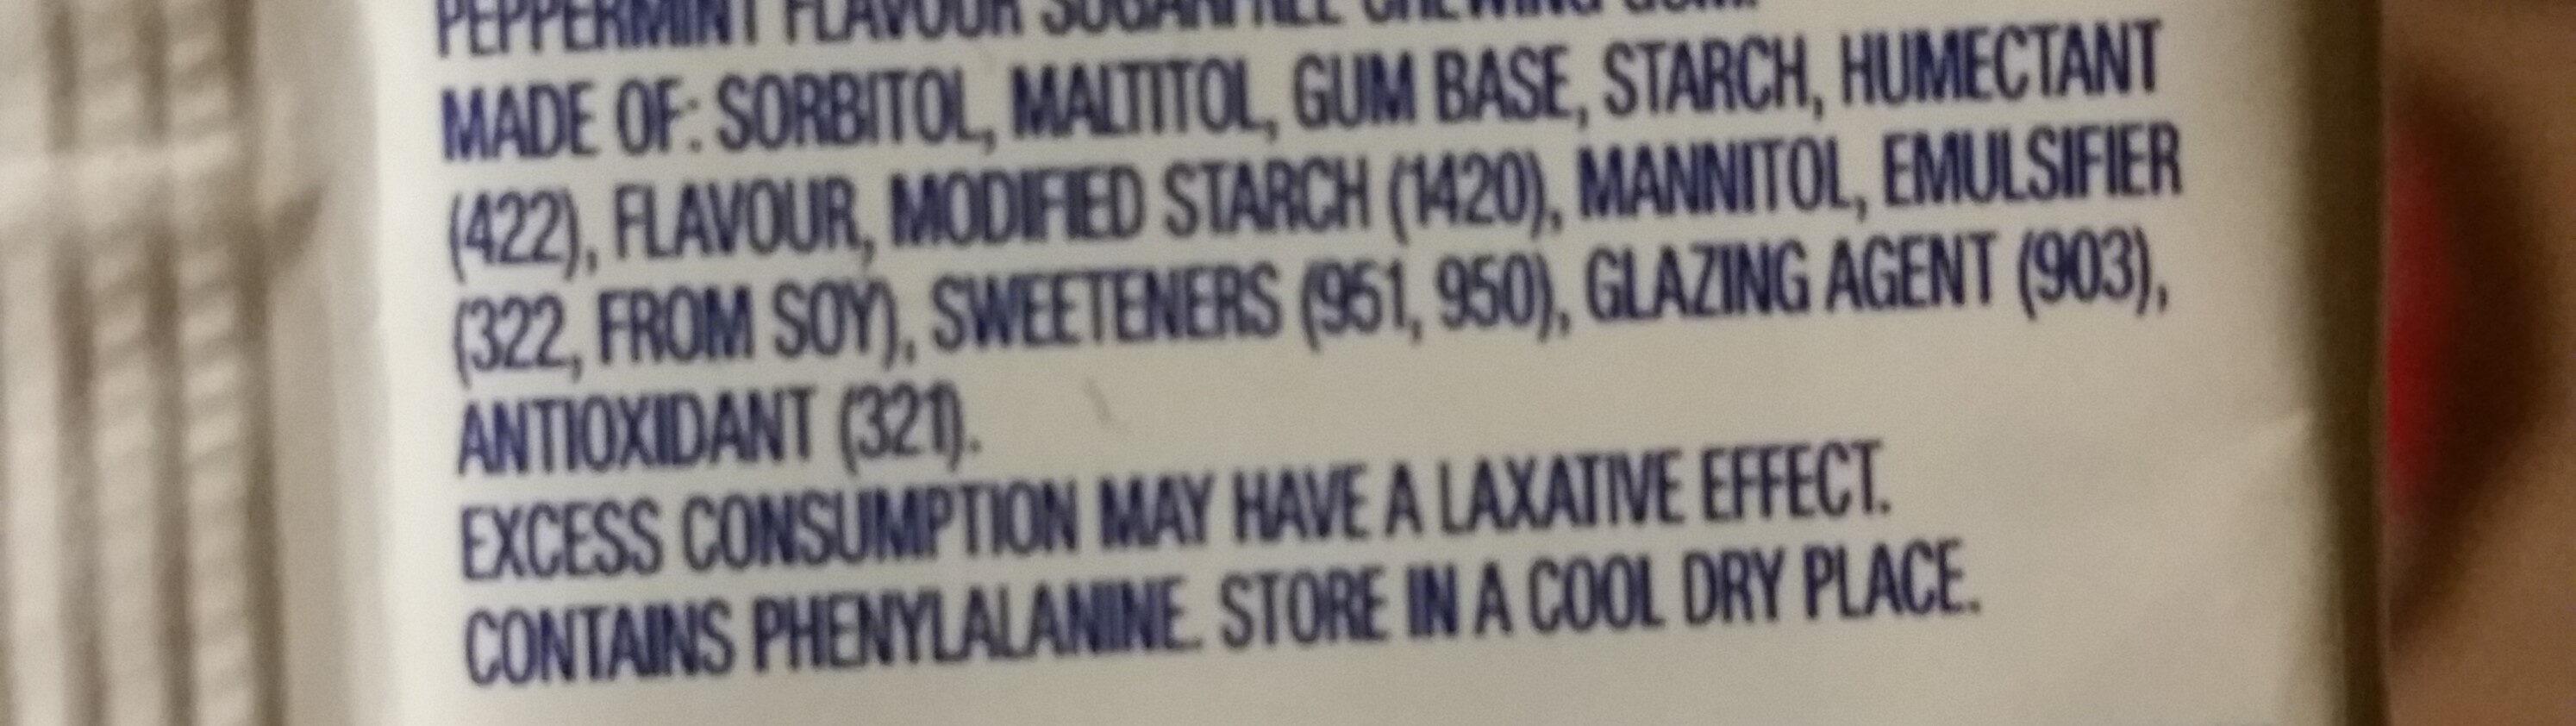 Wrigley's Extra Peppermint Sugarfree Chewing Gum - 4 Pack - Ingredients - en